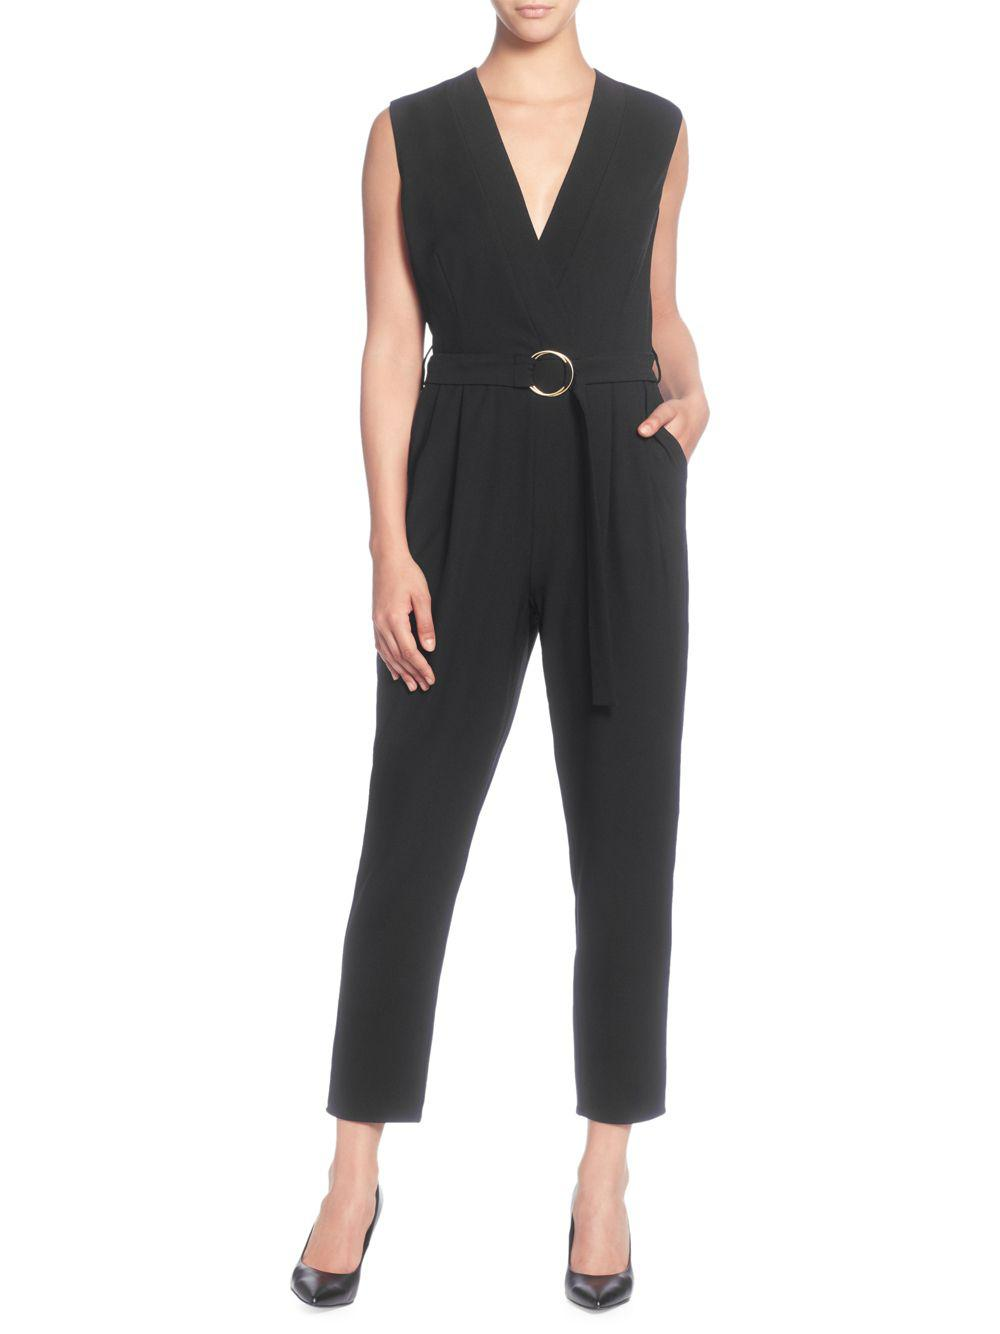 fda165ae6c Catherine Malandrino - Black V-neck Sleeveless Jumpsuit - Lyst. View  fullscreen